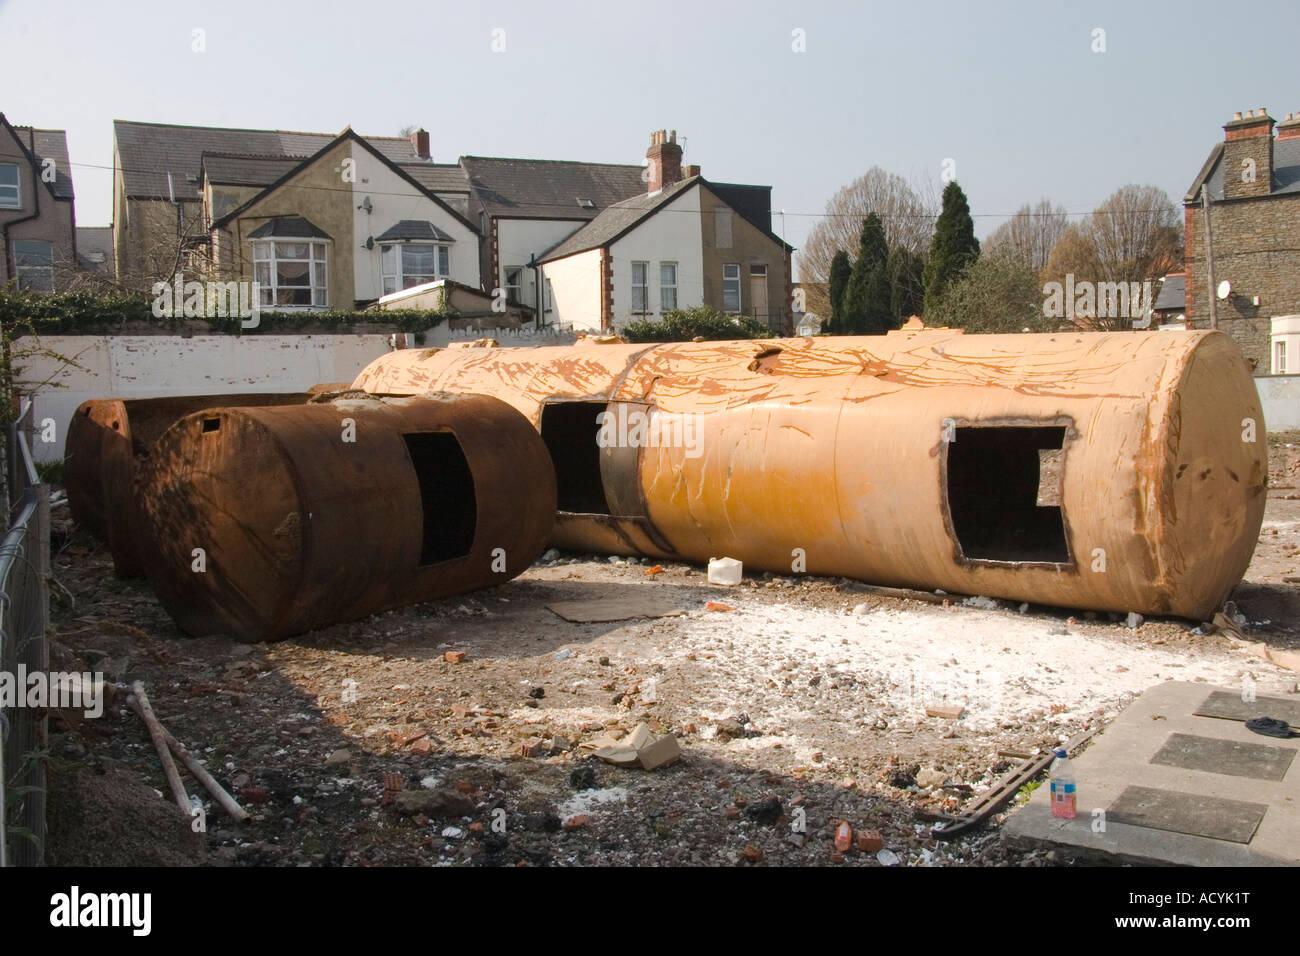 Storage Tank Demolition : Excavated petrol storage tanks on demolition site of old